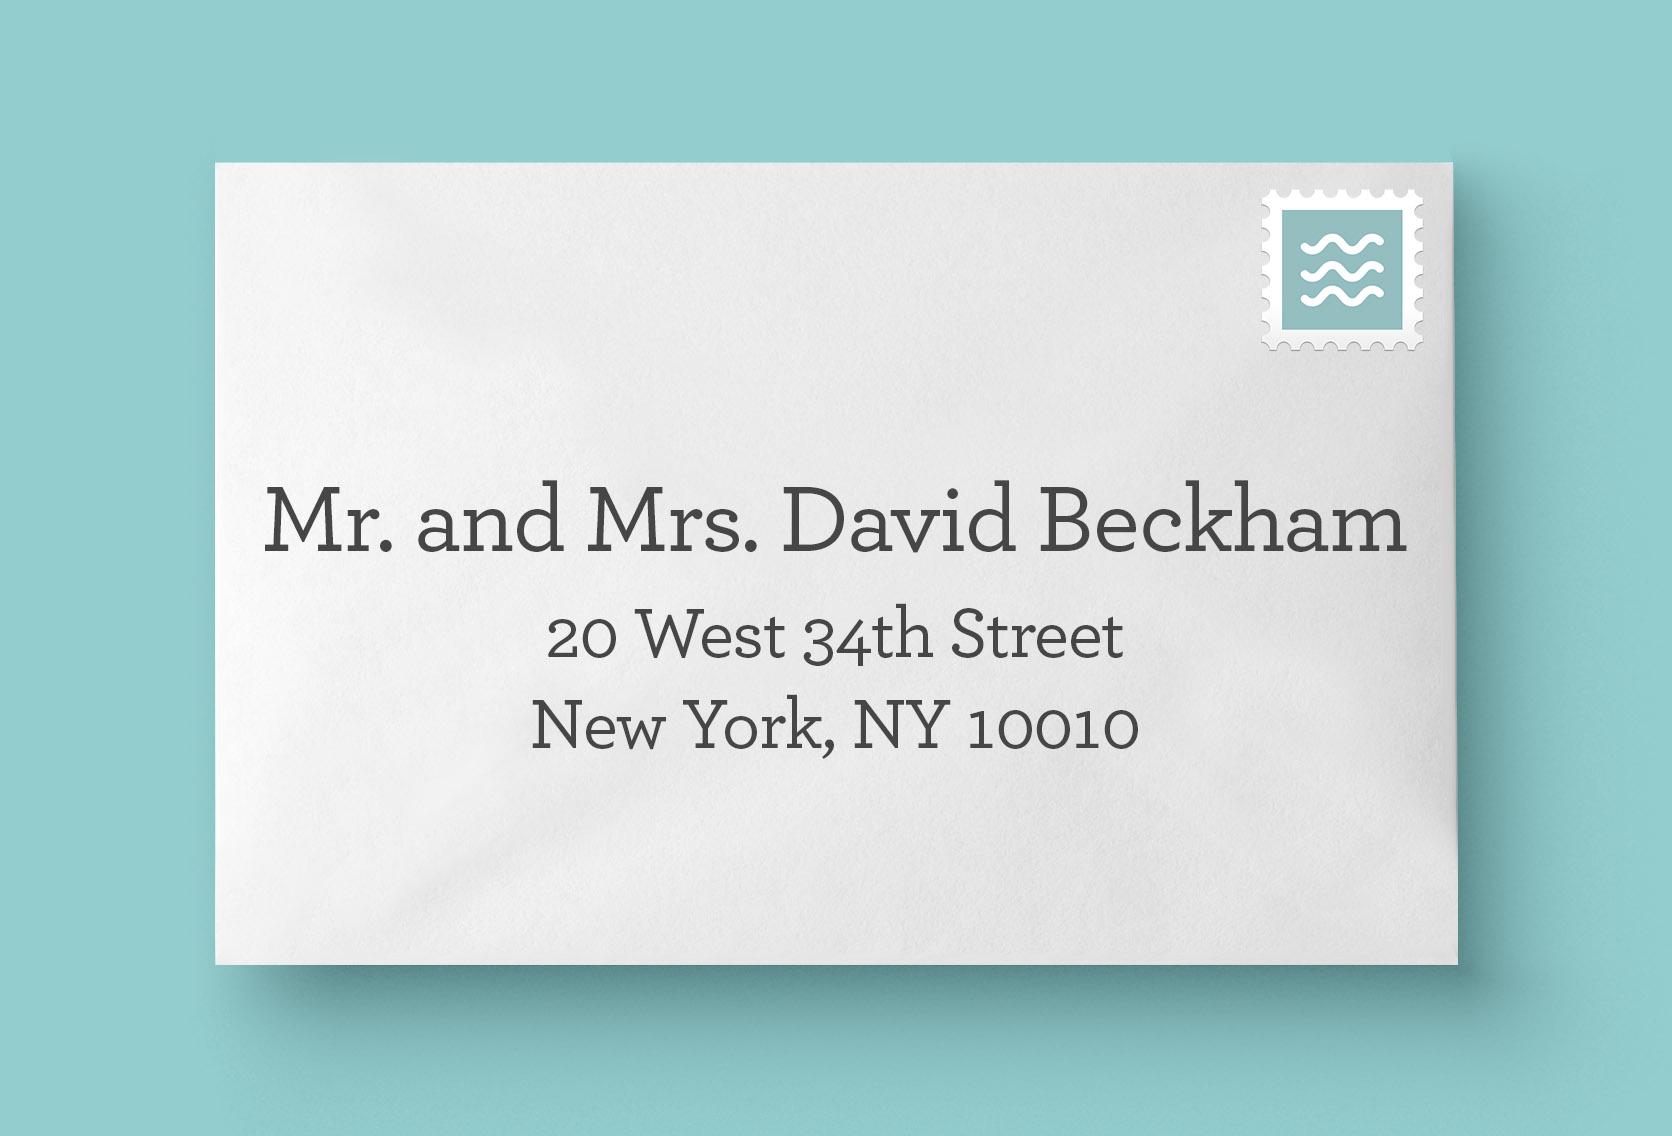 Married-same-name-envelope-address